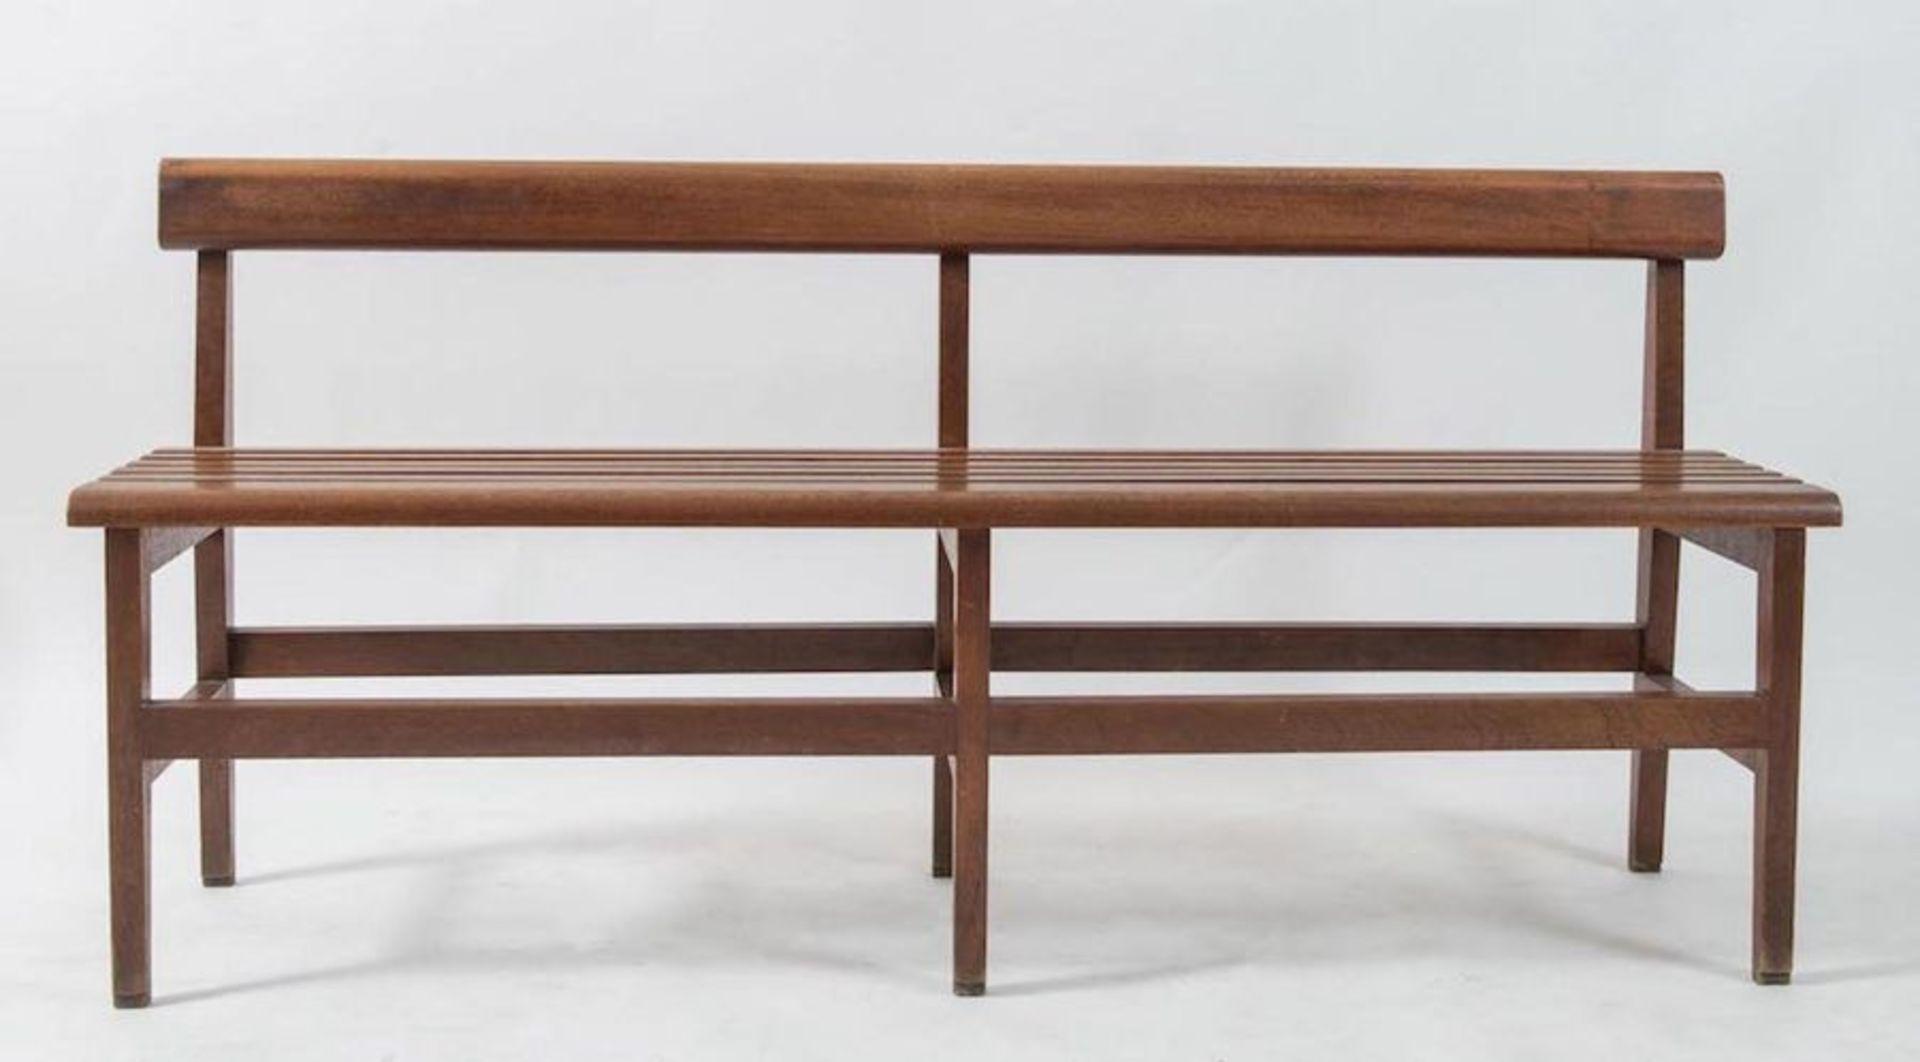 Coppia di panche in legno. Prod. Italia, 1960 ca. Cadauna di cm 70,5x154x34. - Bild 3 aus 3